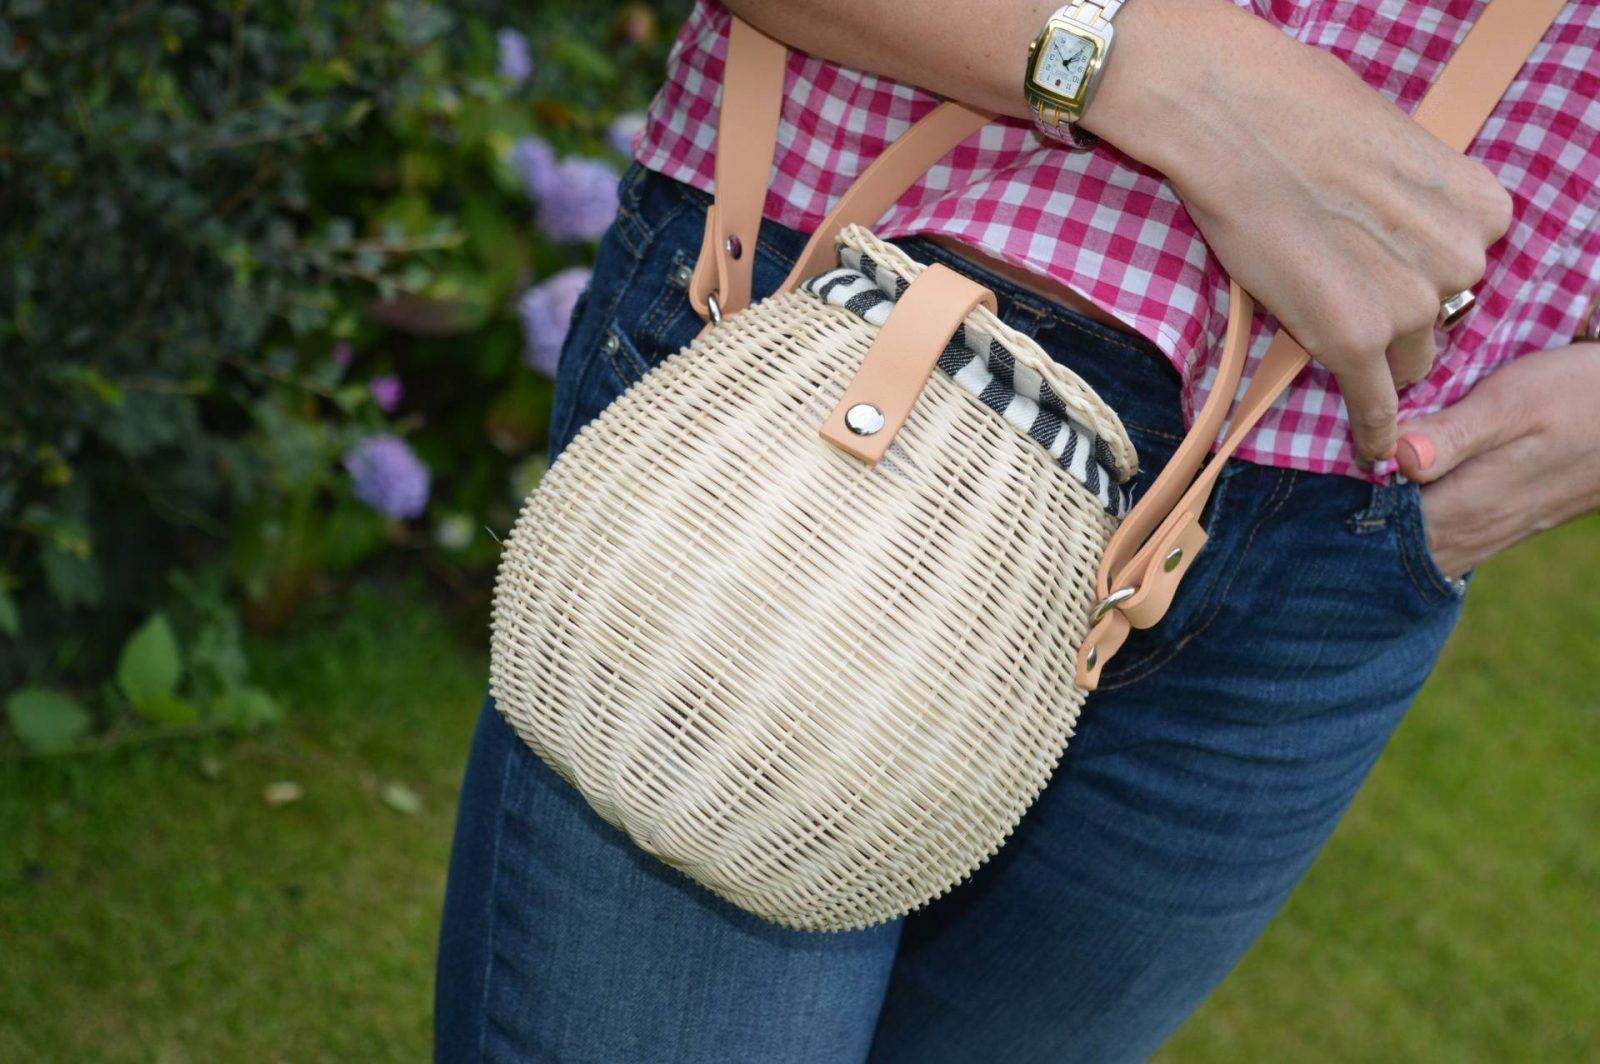 Gingham Ruffles, Denim and Embroidered Shoes Zara gingham top Zara basket bag